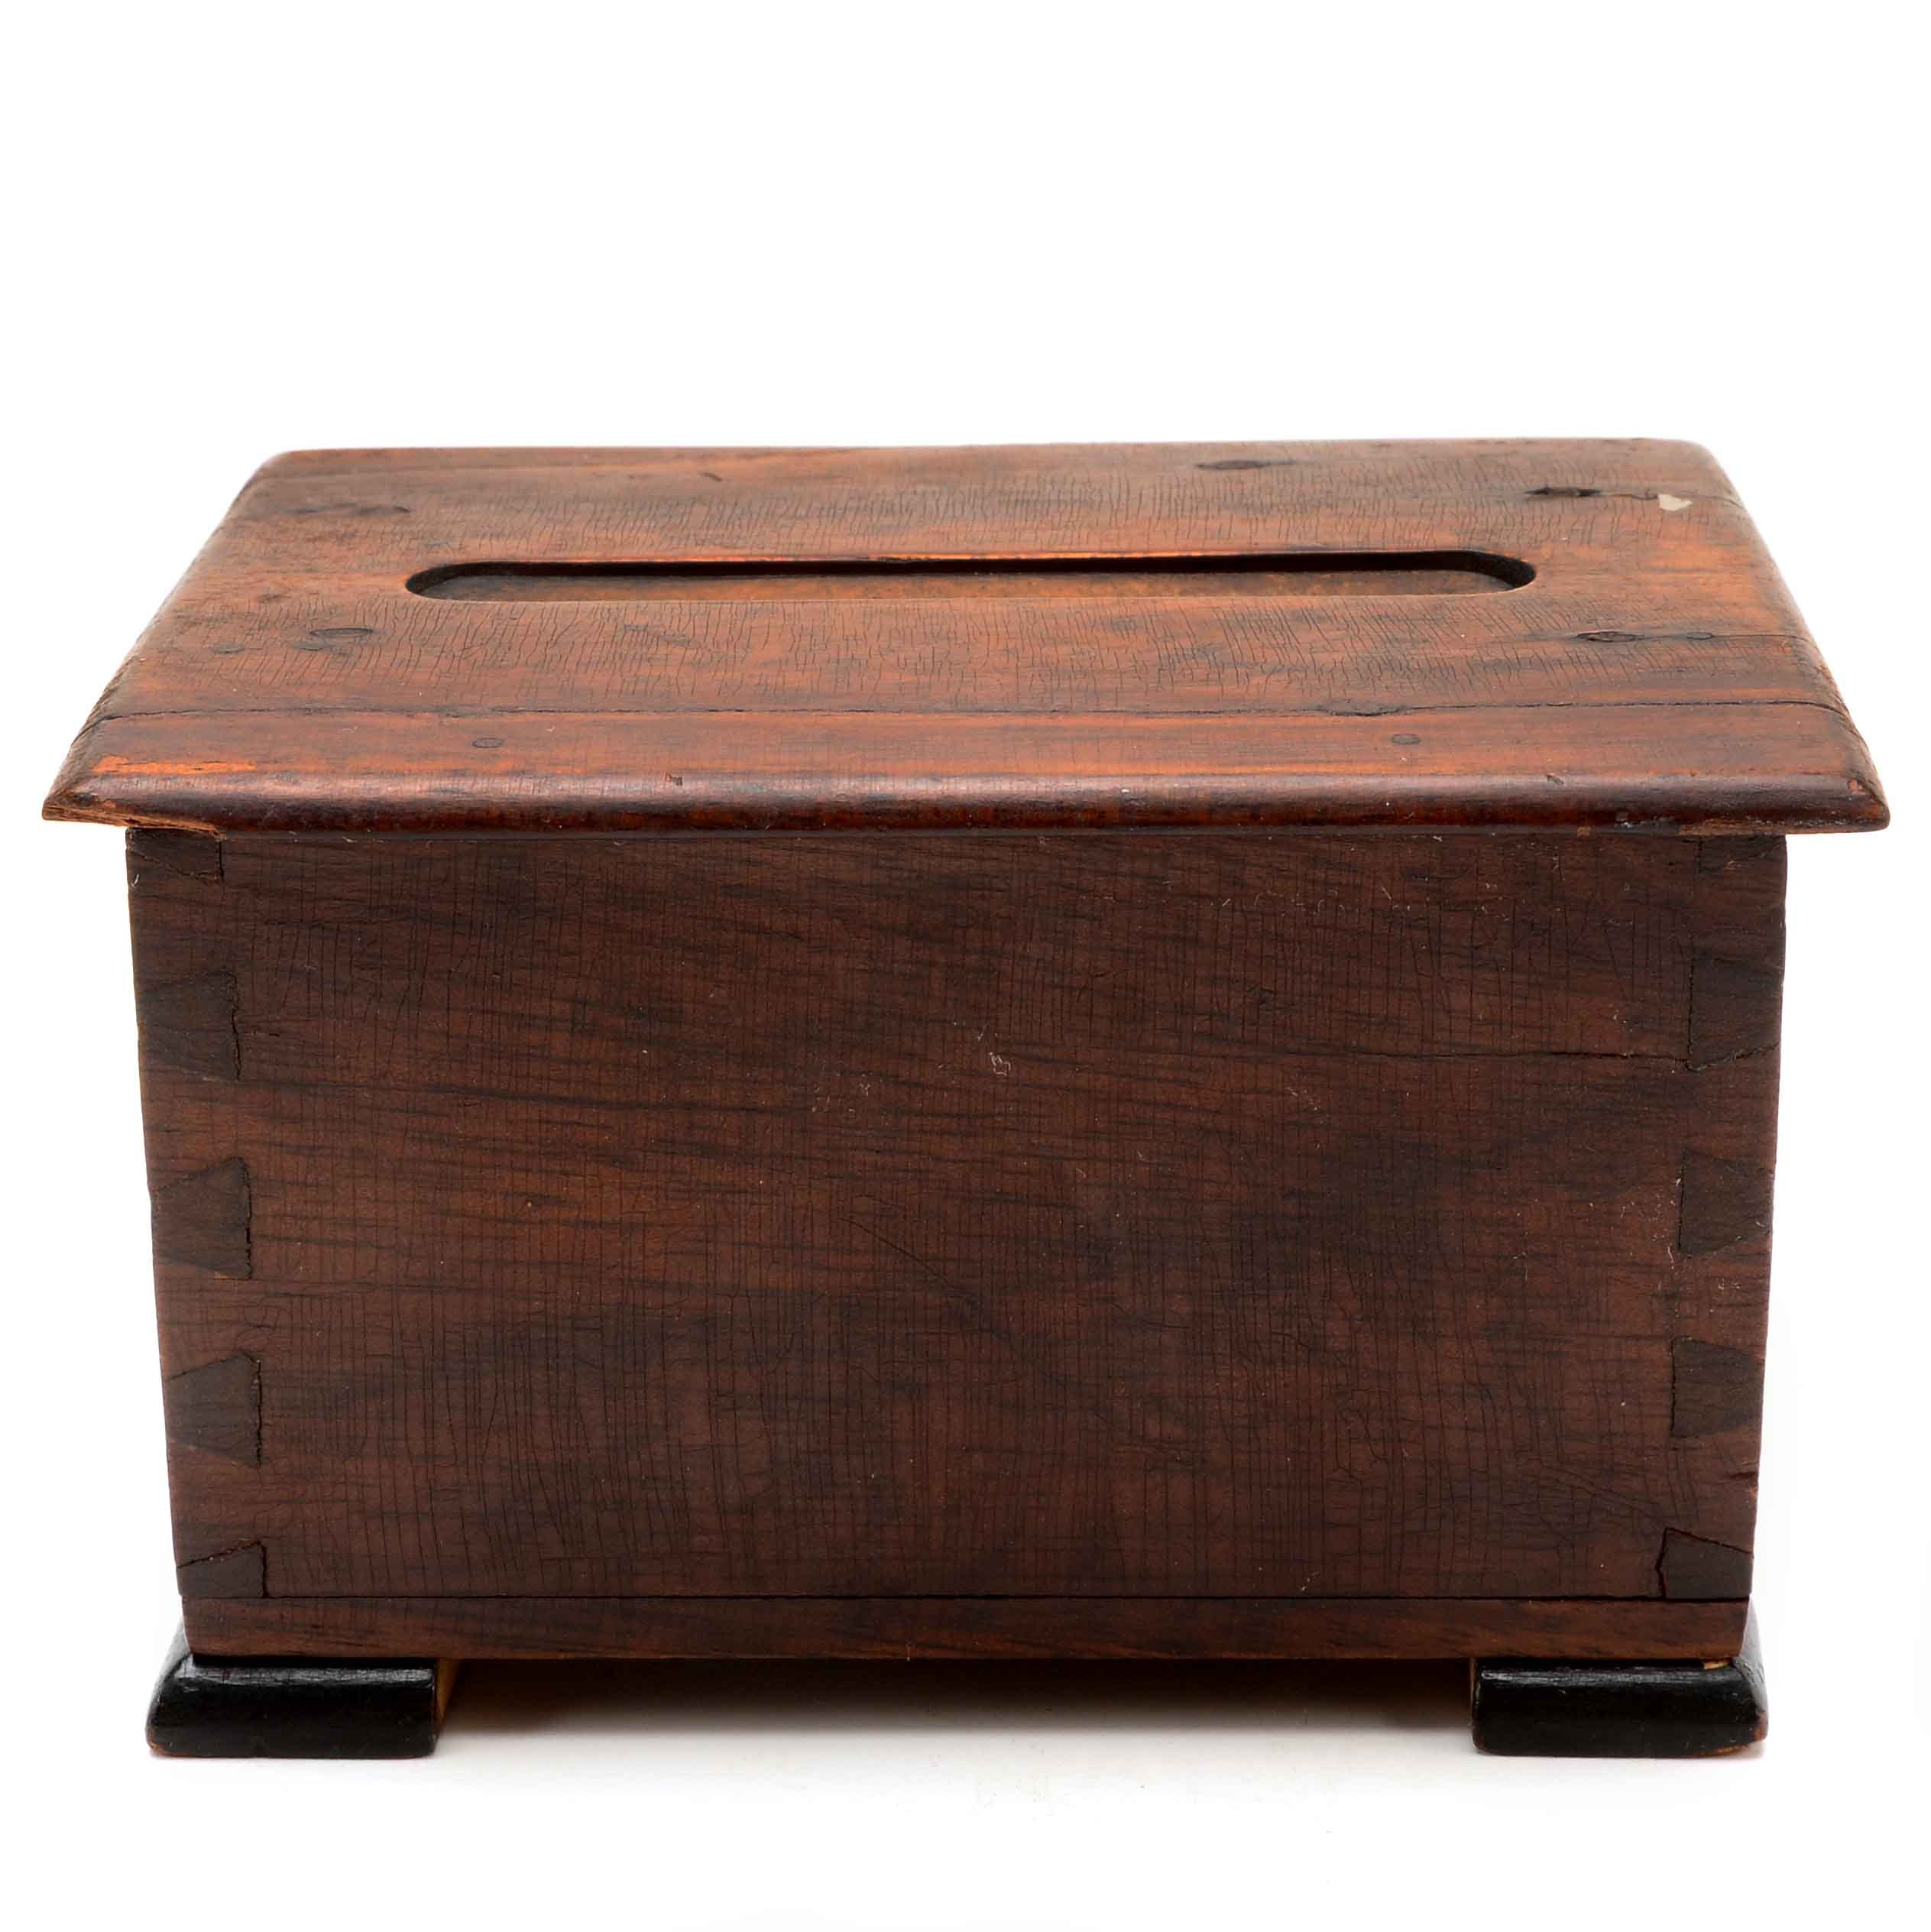 Antique Cigarette Dispenser Box